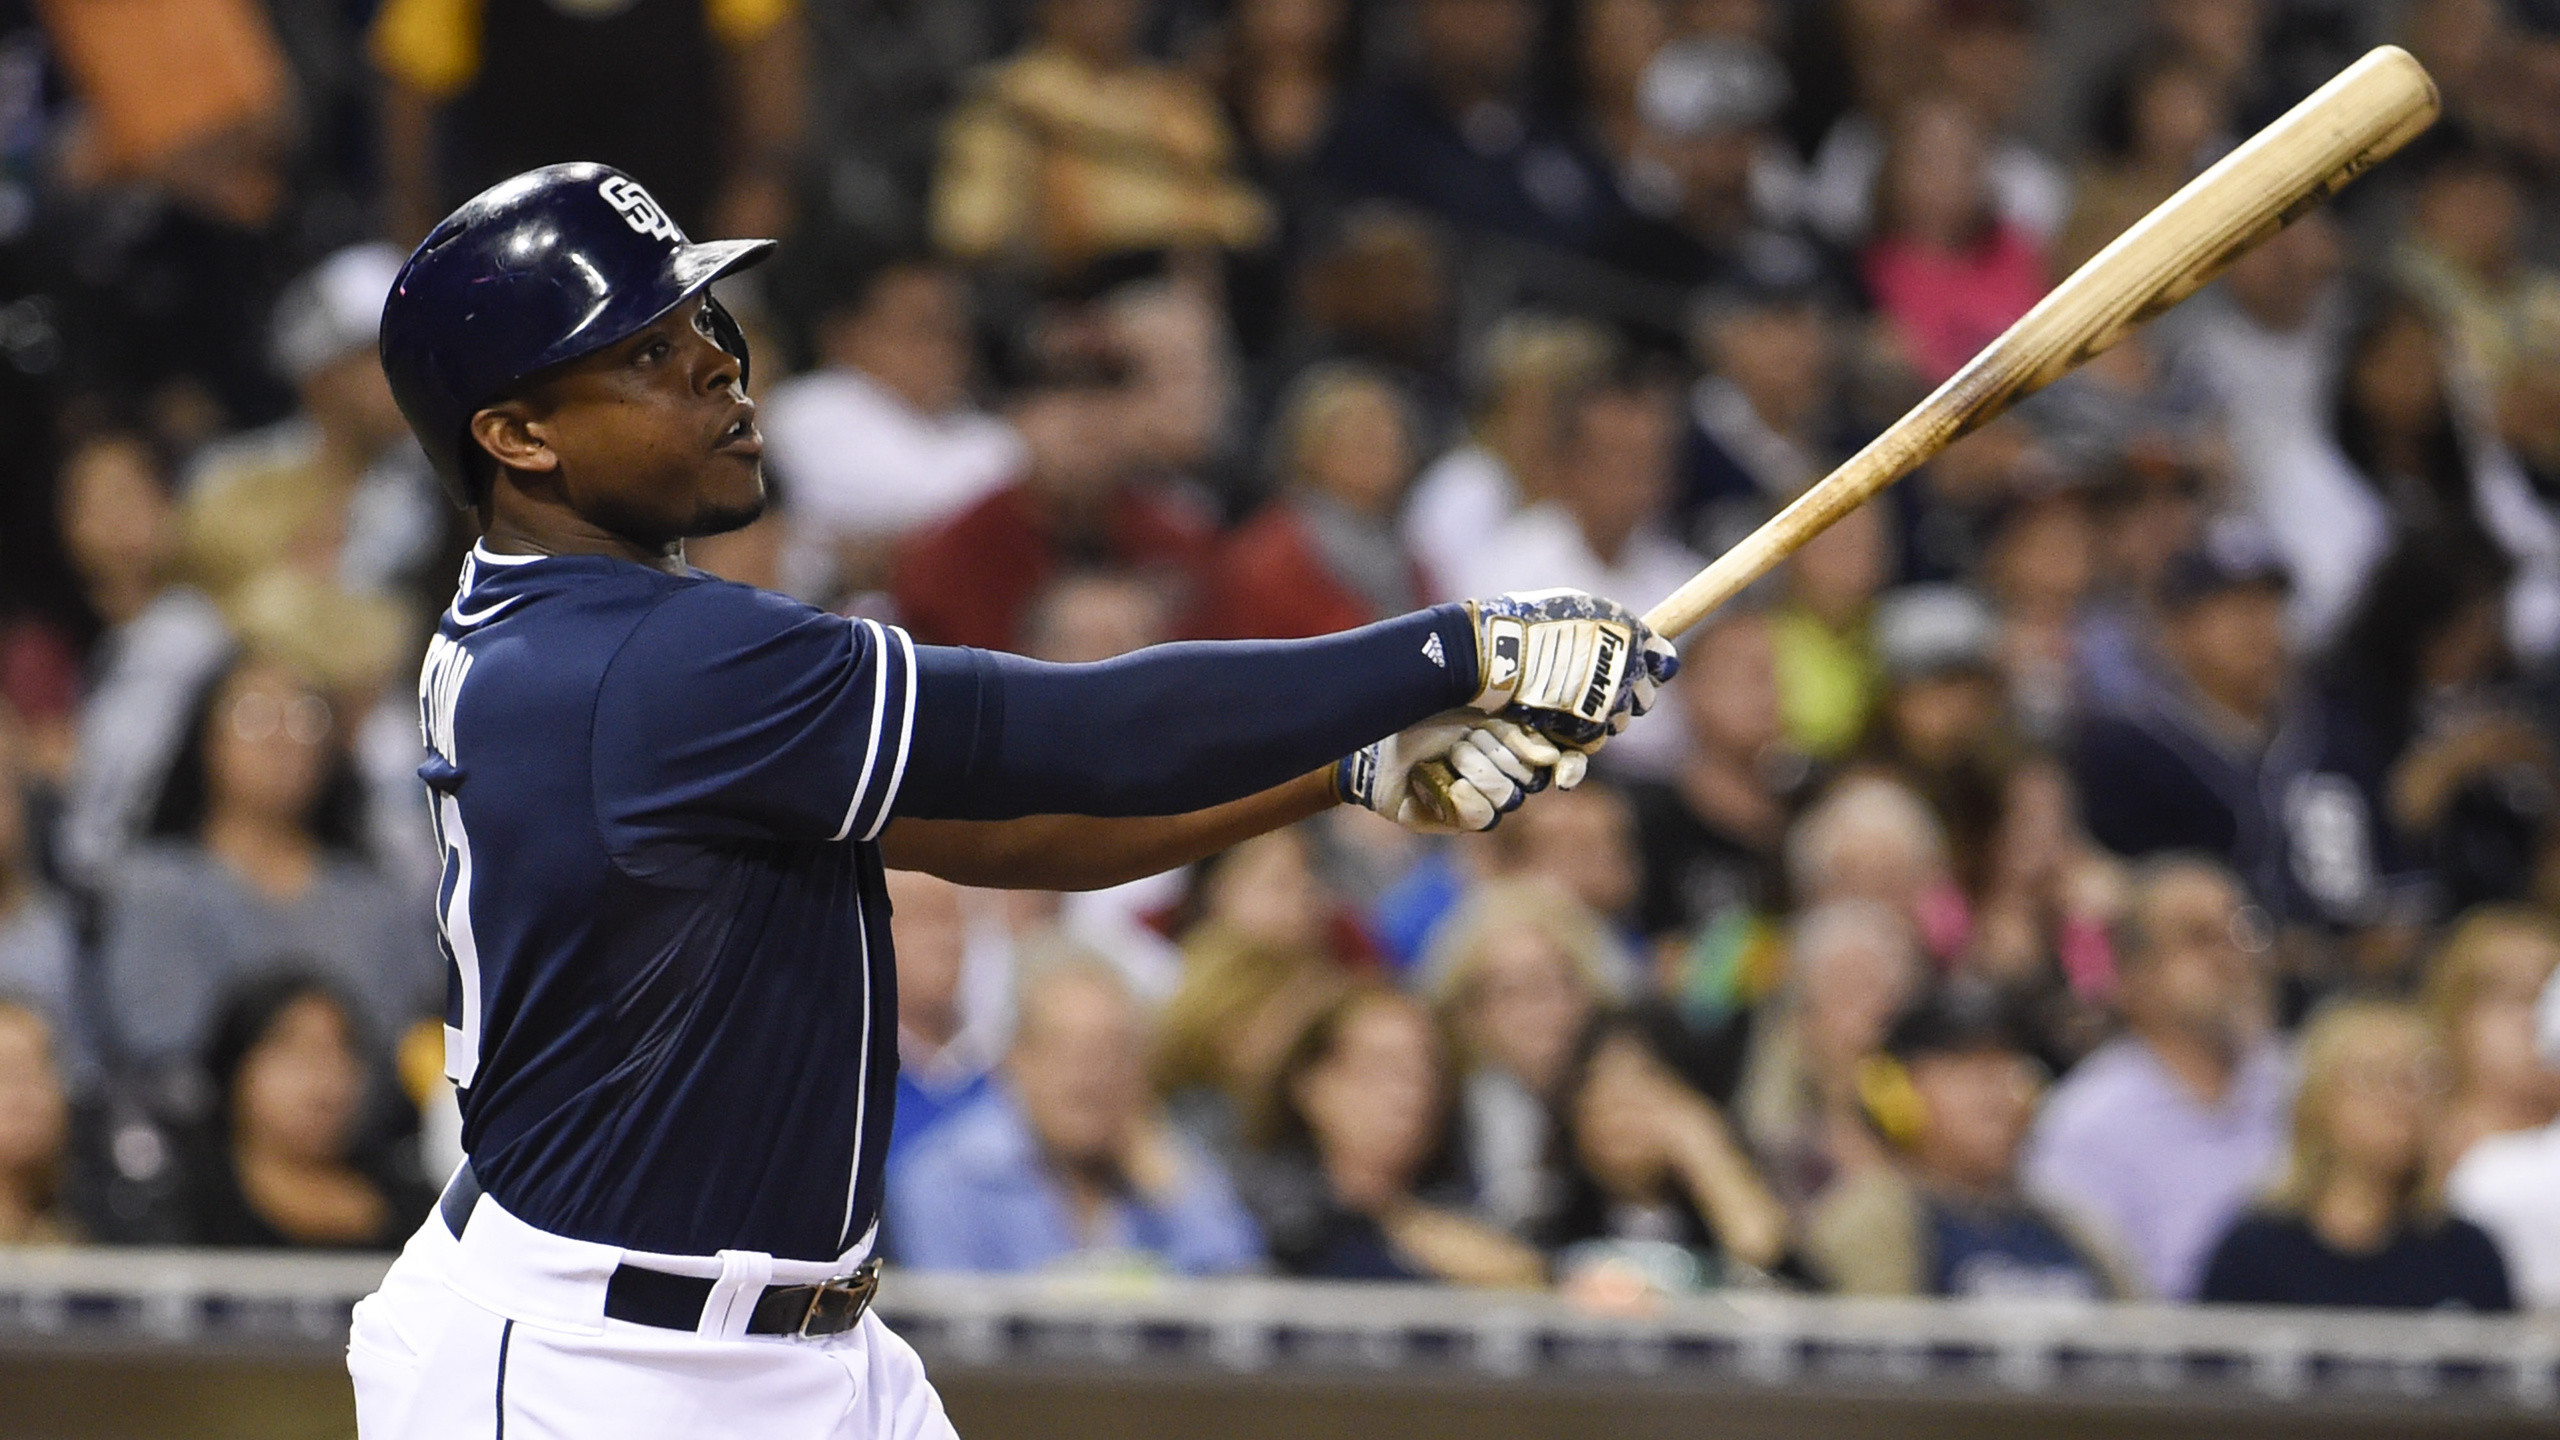 San Diego Padres Batter, Batter, Mlb, Baseball, San Diego Padres, Sports